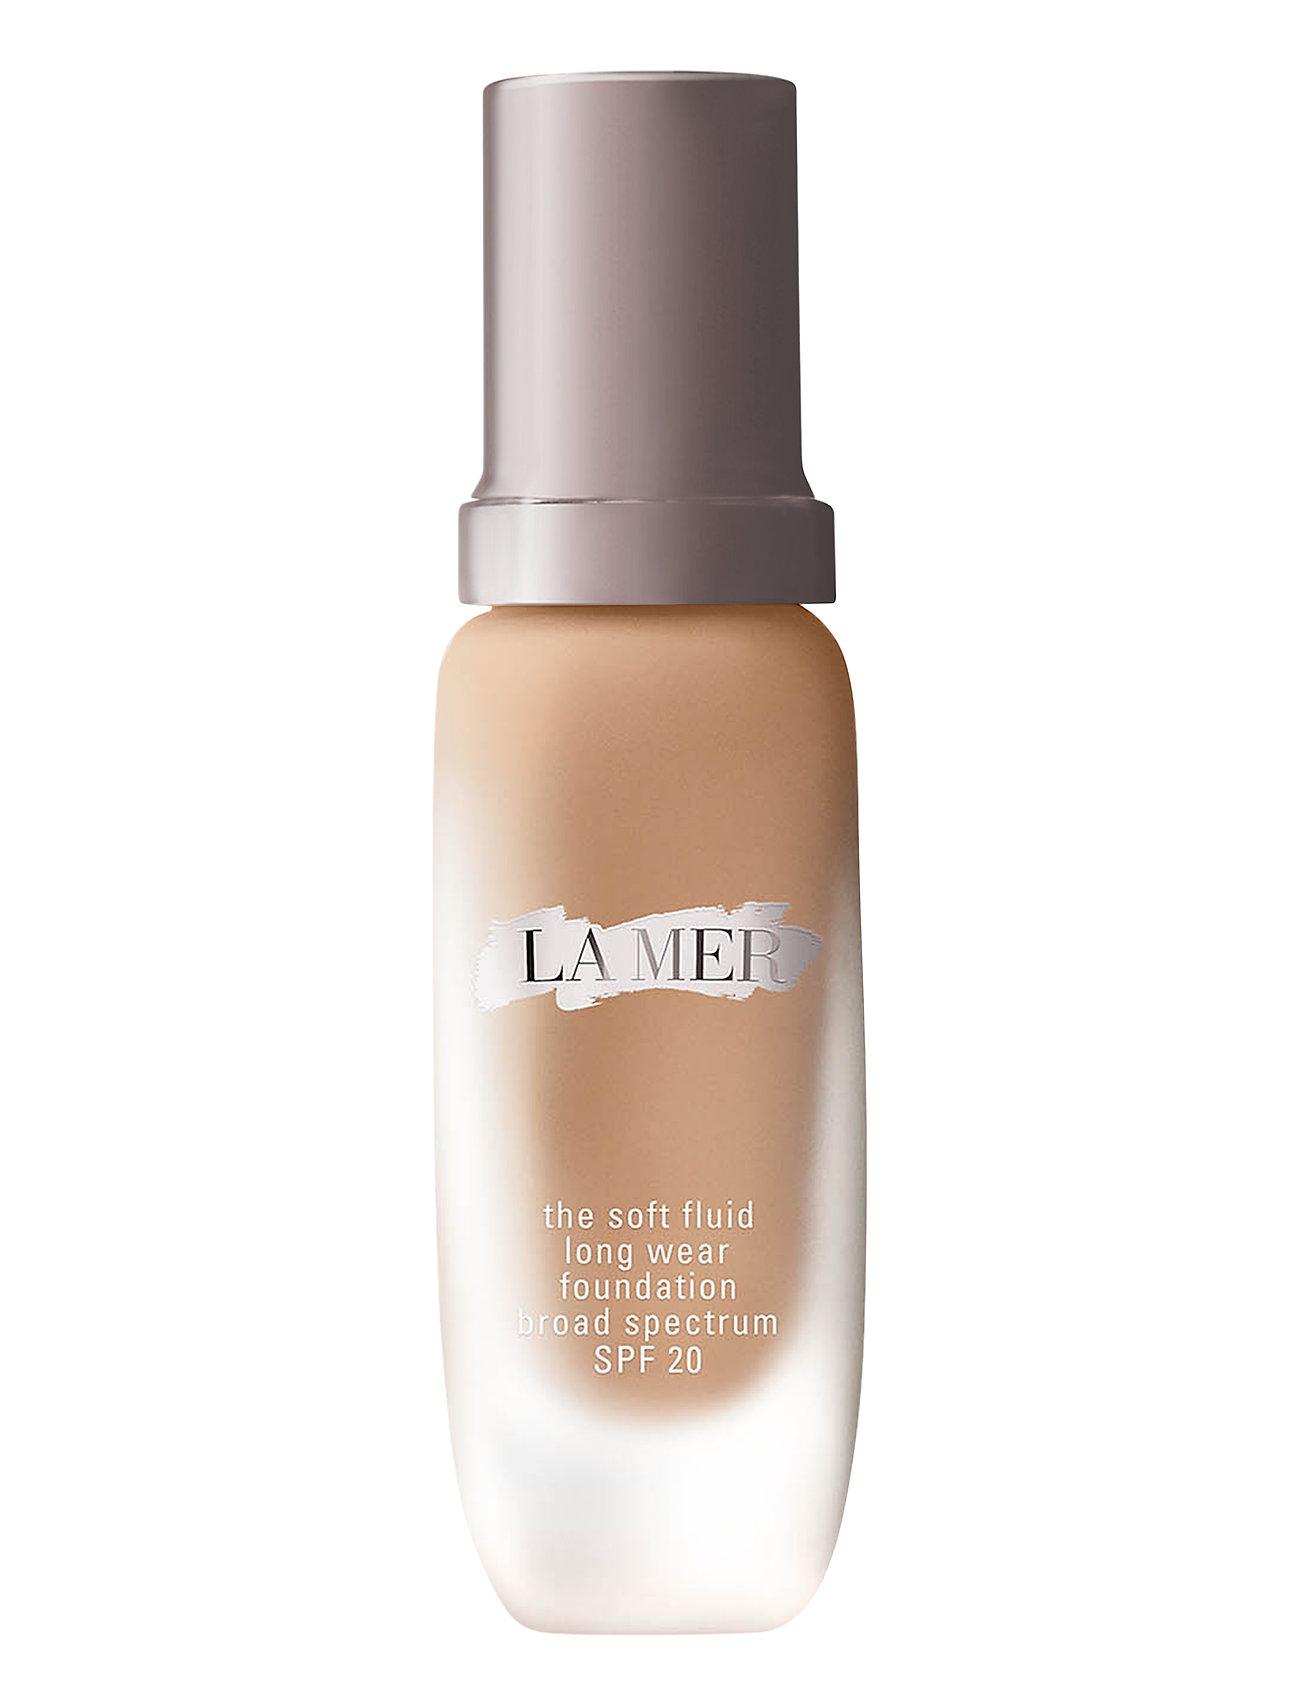 Image of The Soft Fluid Long Wear Foundation Spf20 Foundation Makeup La Mer (3421206757)